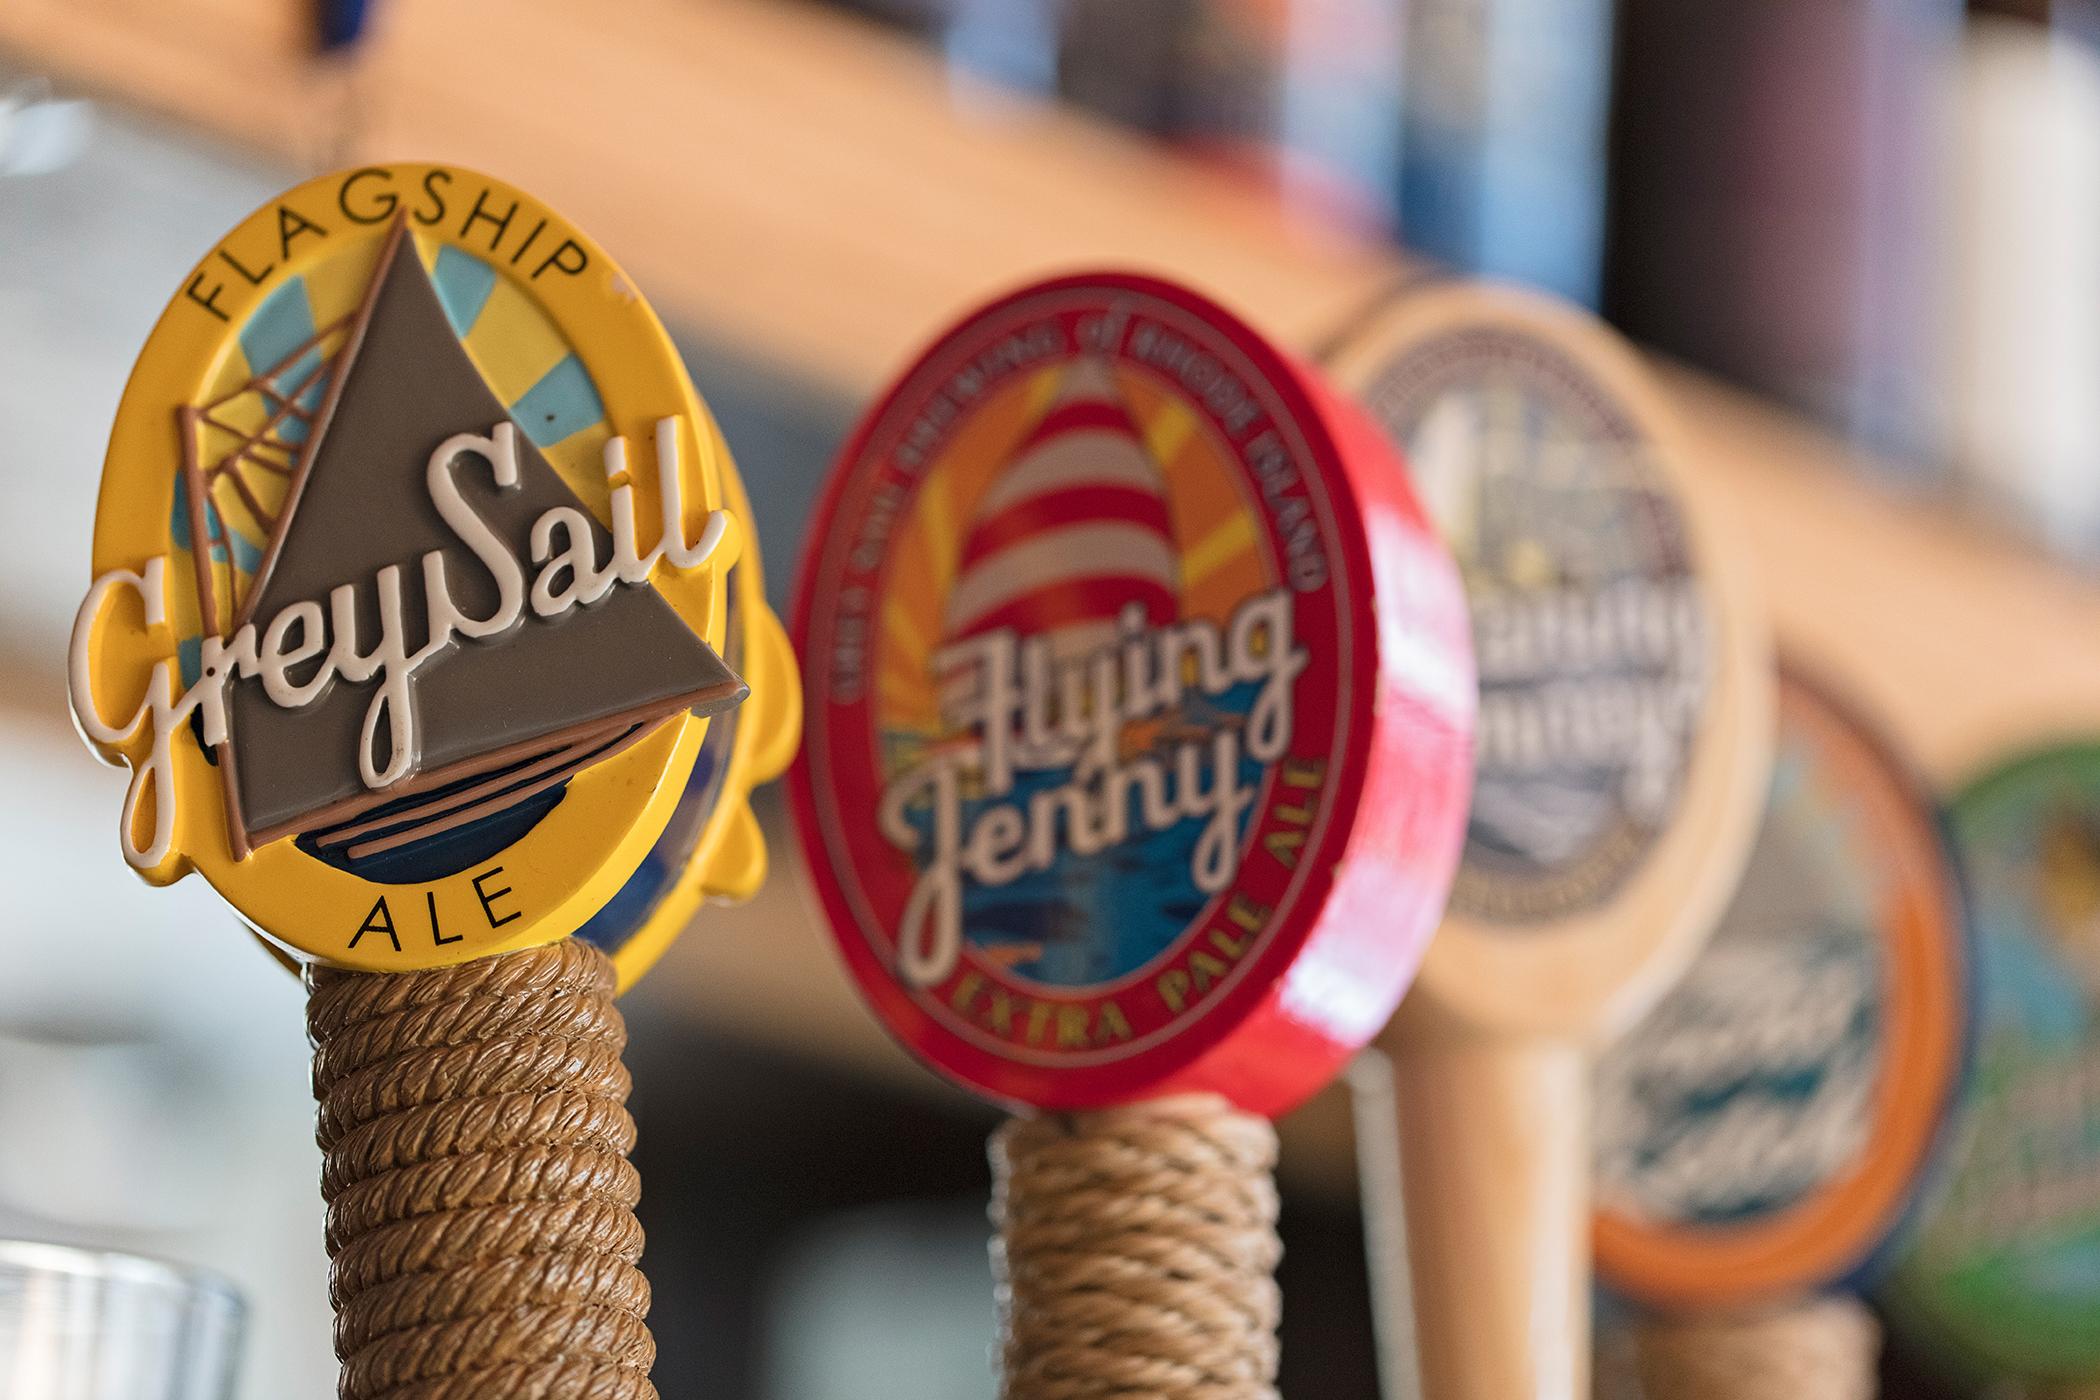 westerly-rhode-island-grey-sail-brewery.jpg?mtime=20180409090452#asset:101340